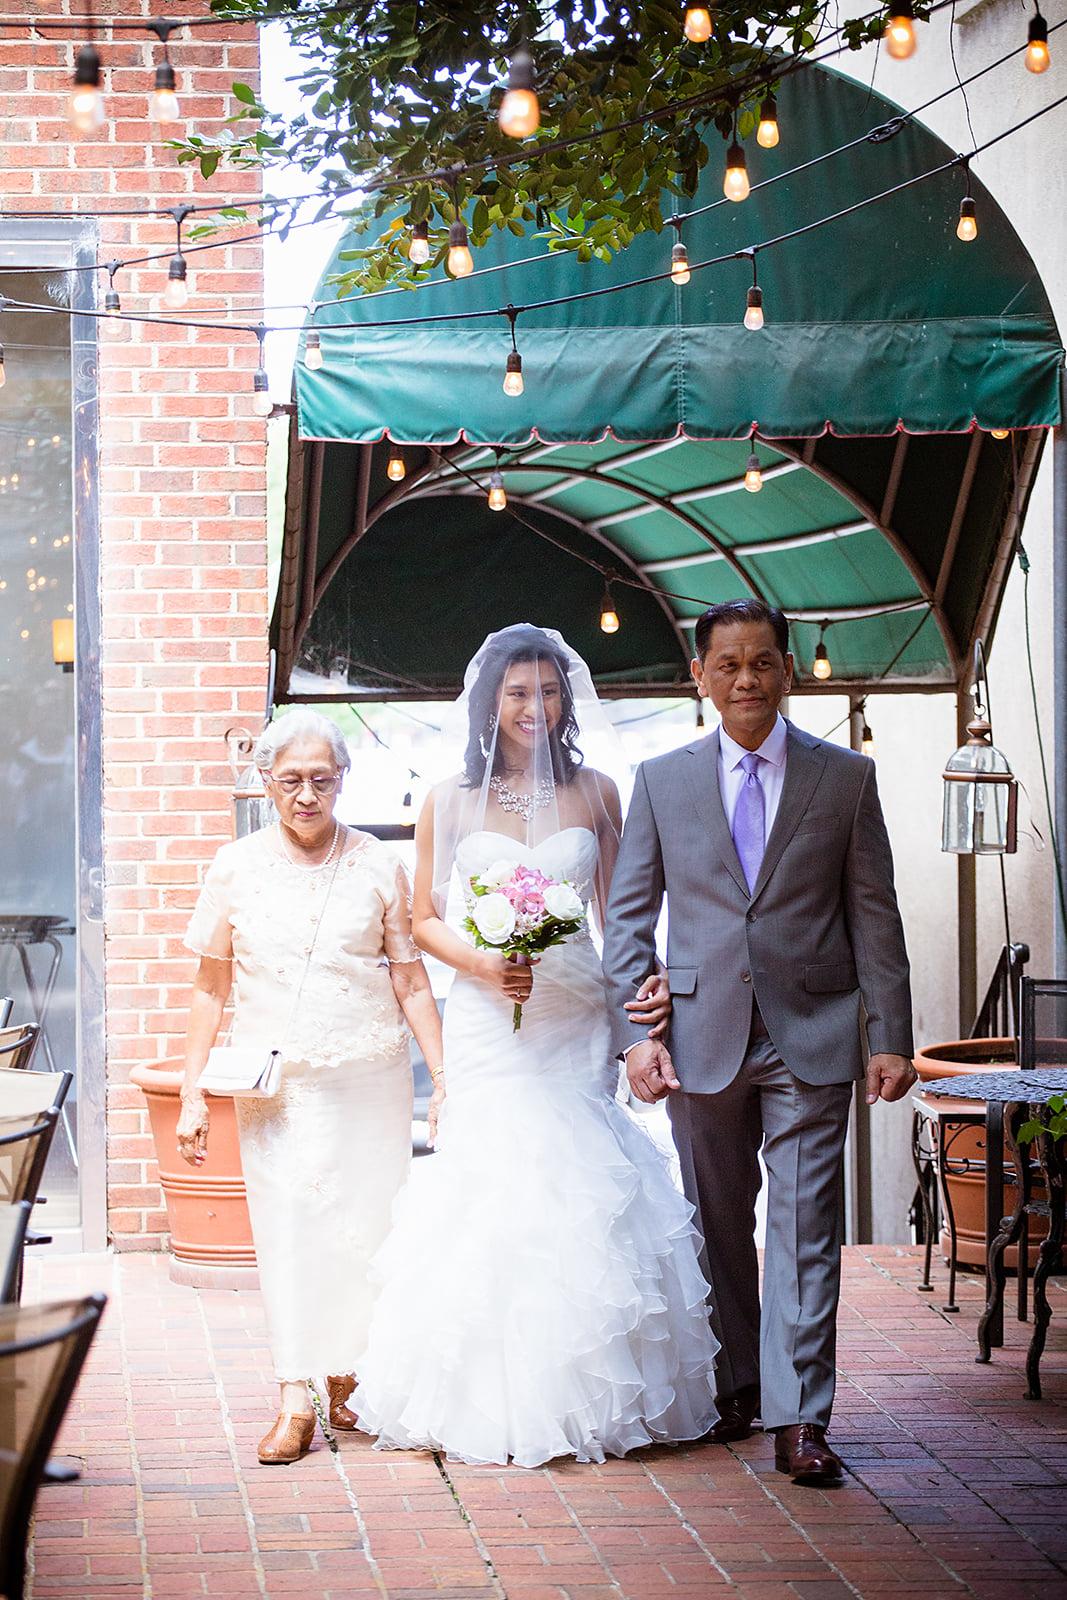 BenYahudah Wedding - Ceremony-21.jpg